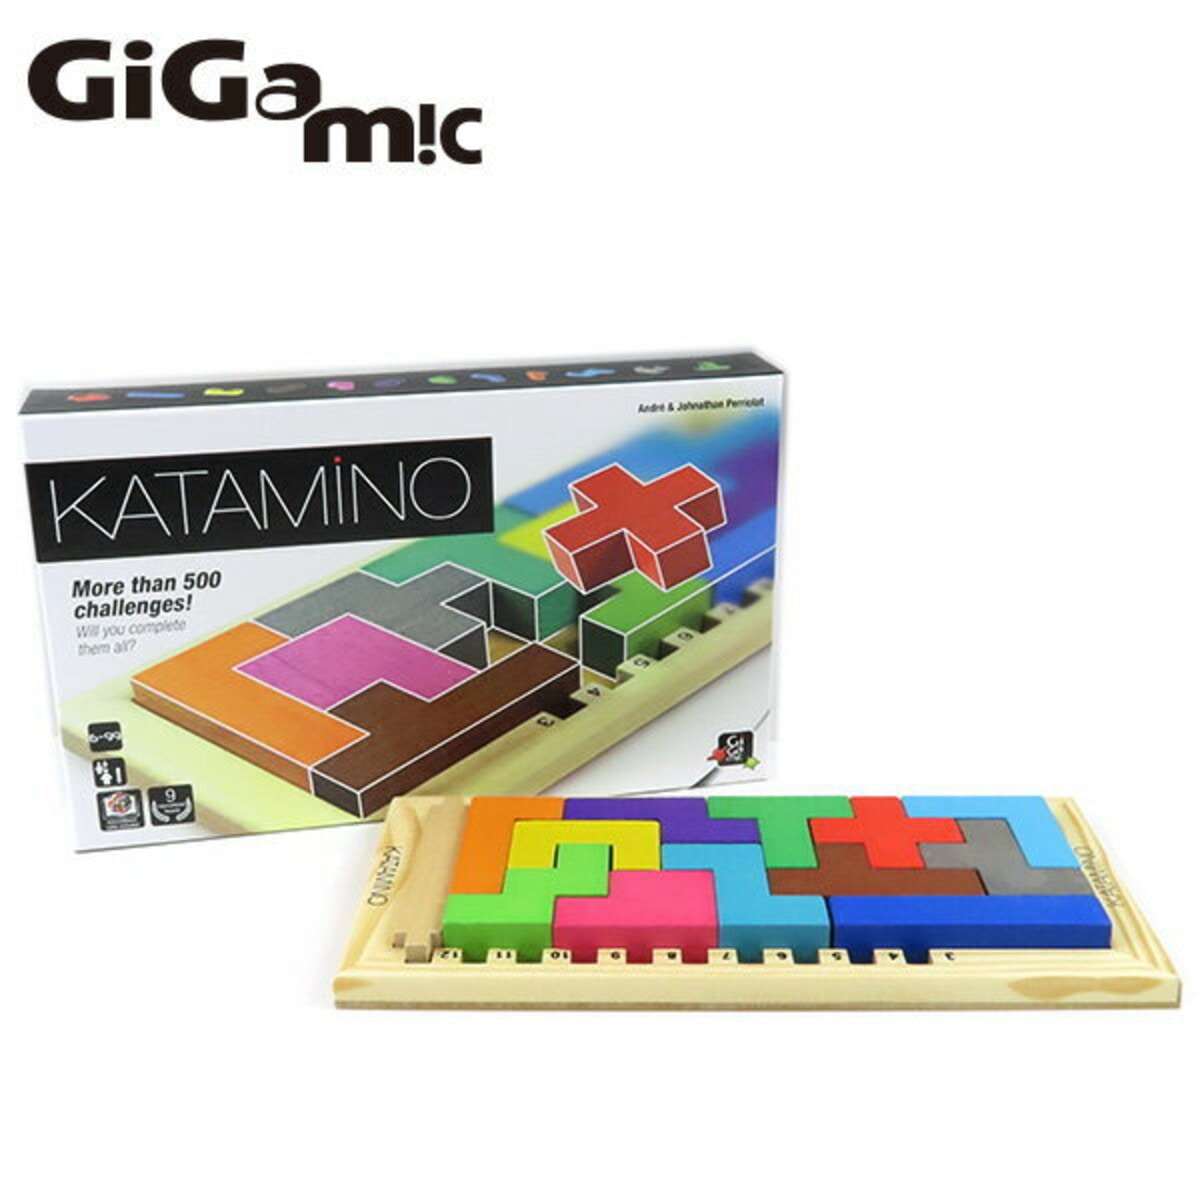 Gigamic(ギガミック)「 KATAMINO(カタミノ)」